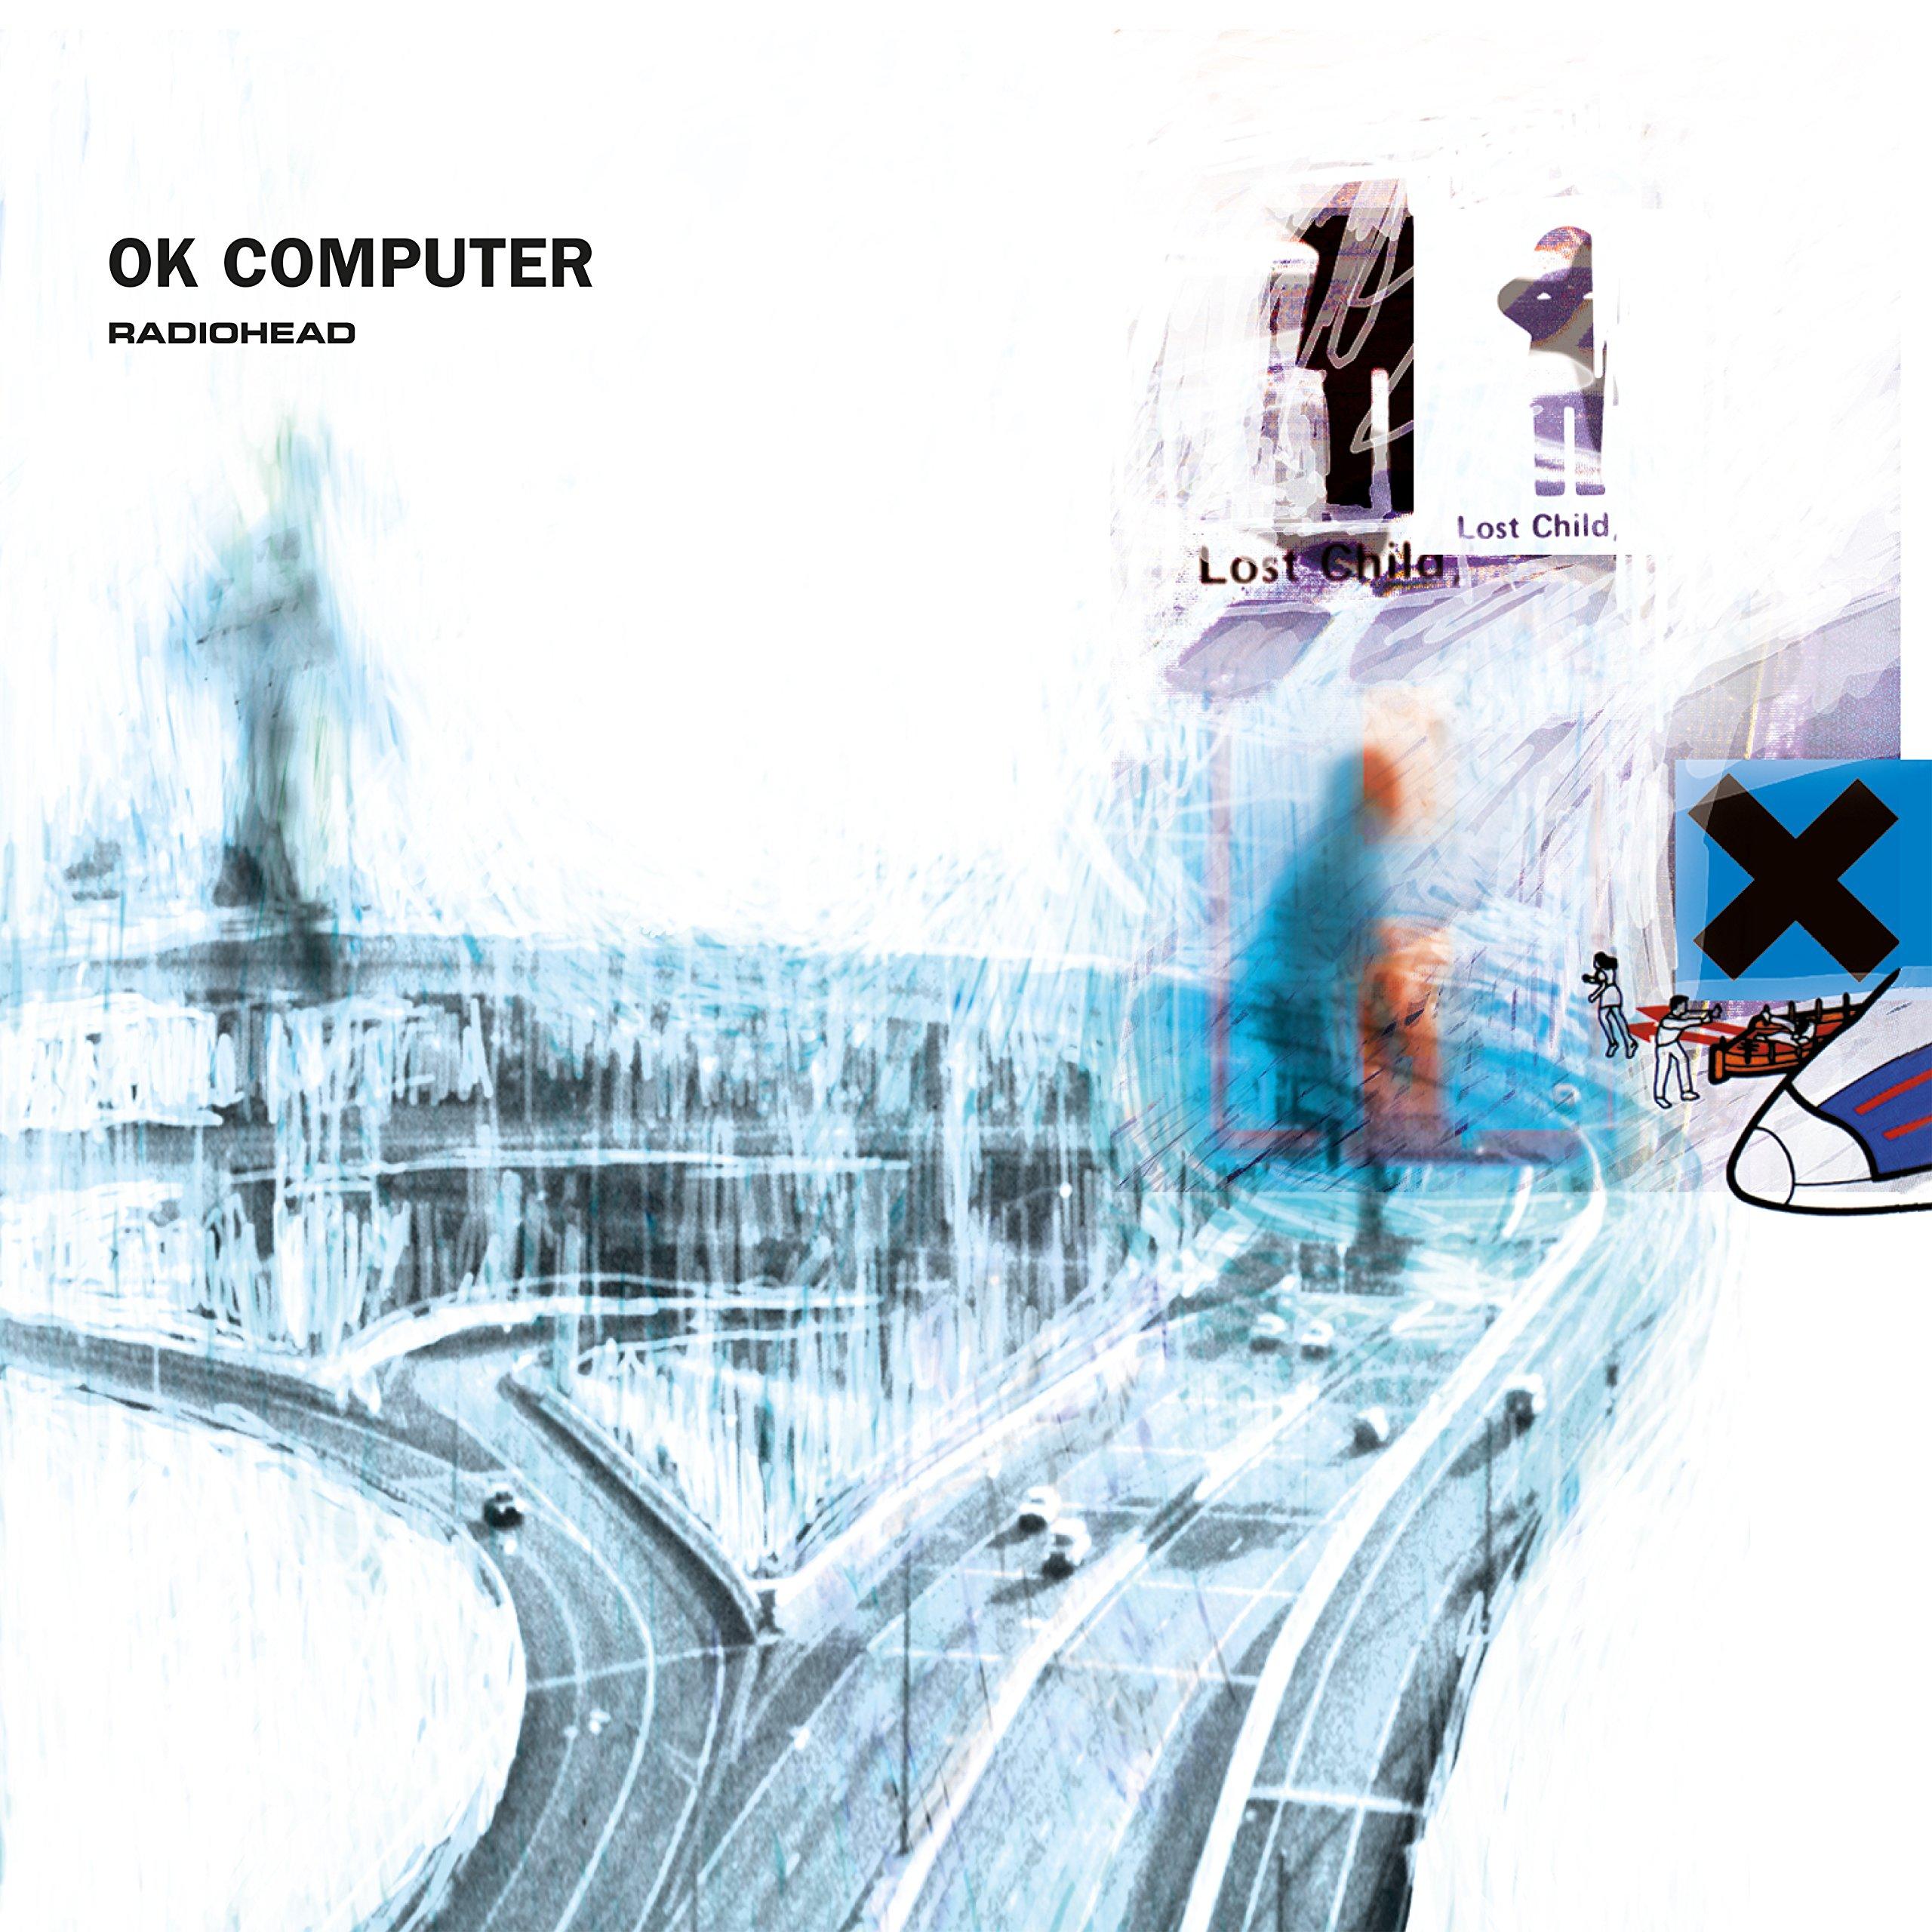 Vinilo : Radiohead - Ok Computer (180 Gram Vinyl, 2 Disc)